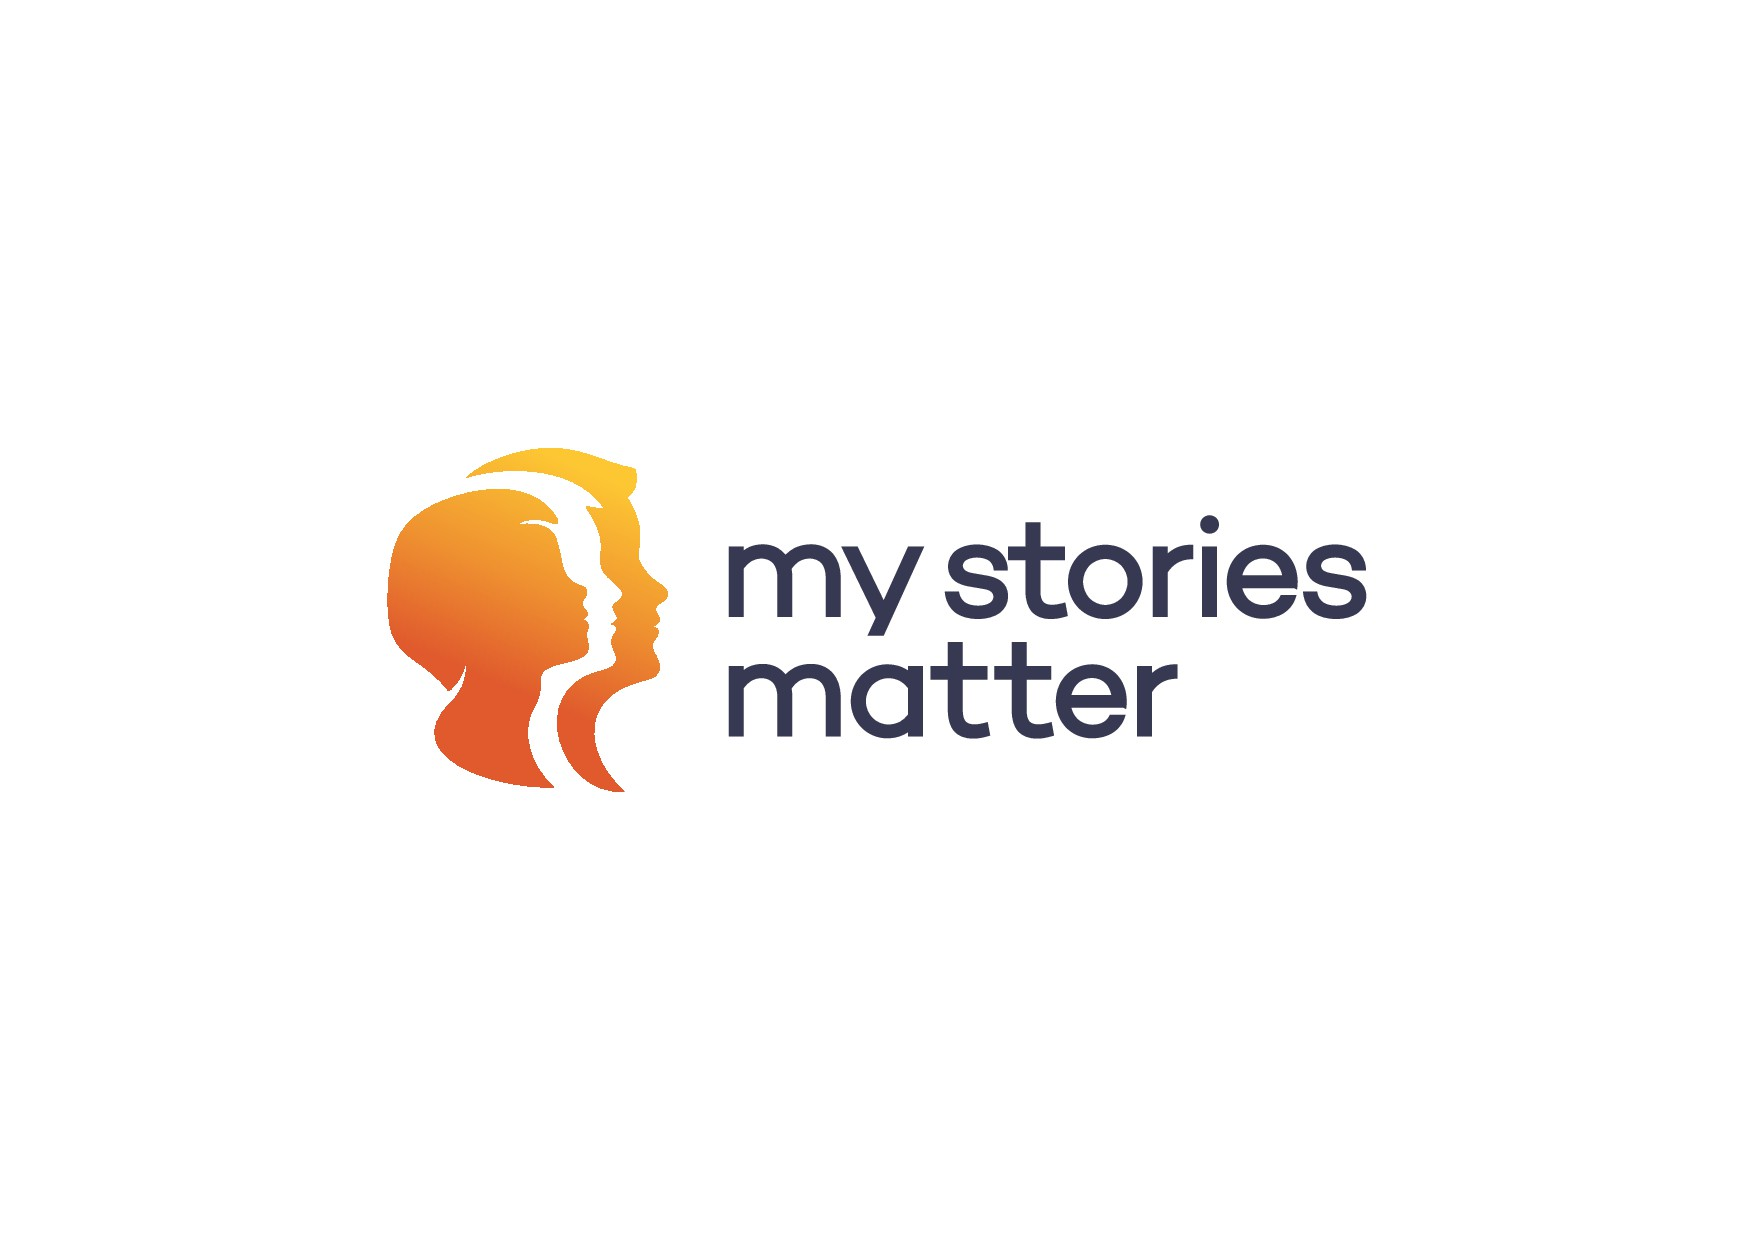 Sentimental, Reassuring, Comforting Logo Needed for Digital Storytelling App